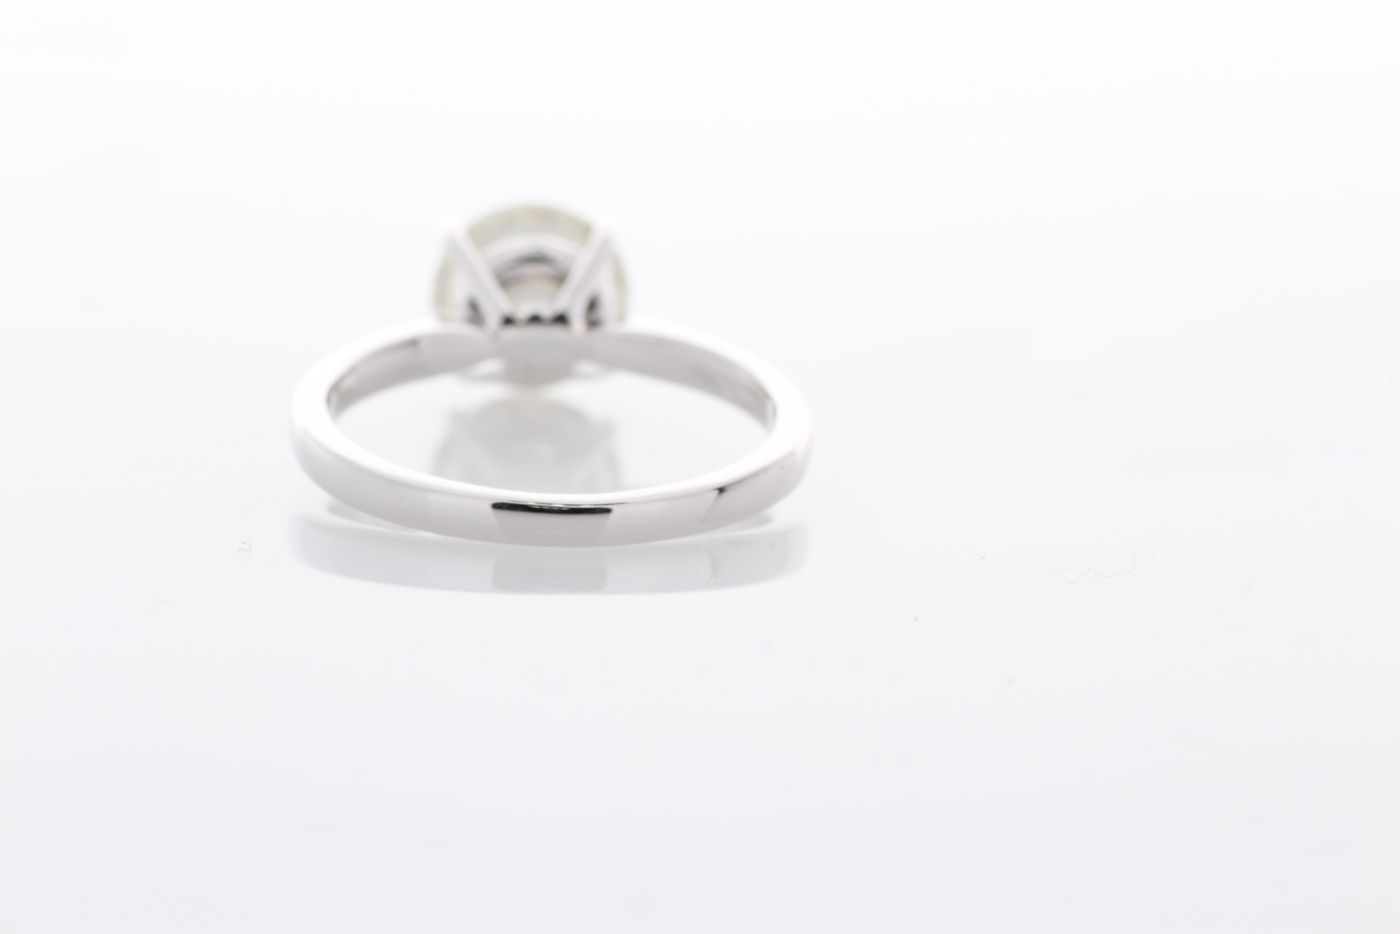 18ct White Gold Single Stone Prong Set Diamond Ring 2.02 Carats - Image 3 of 5